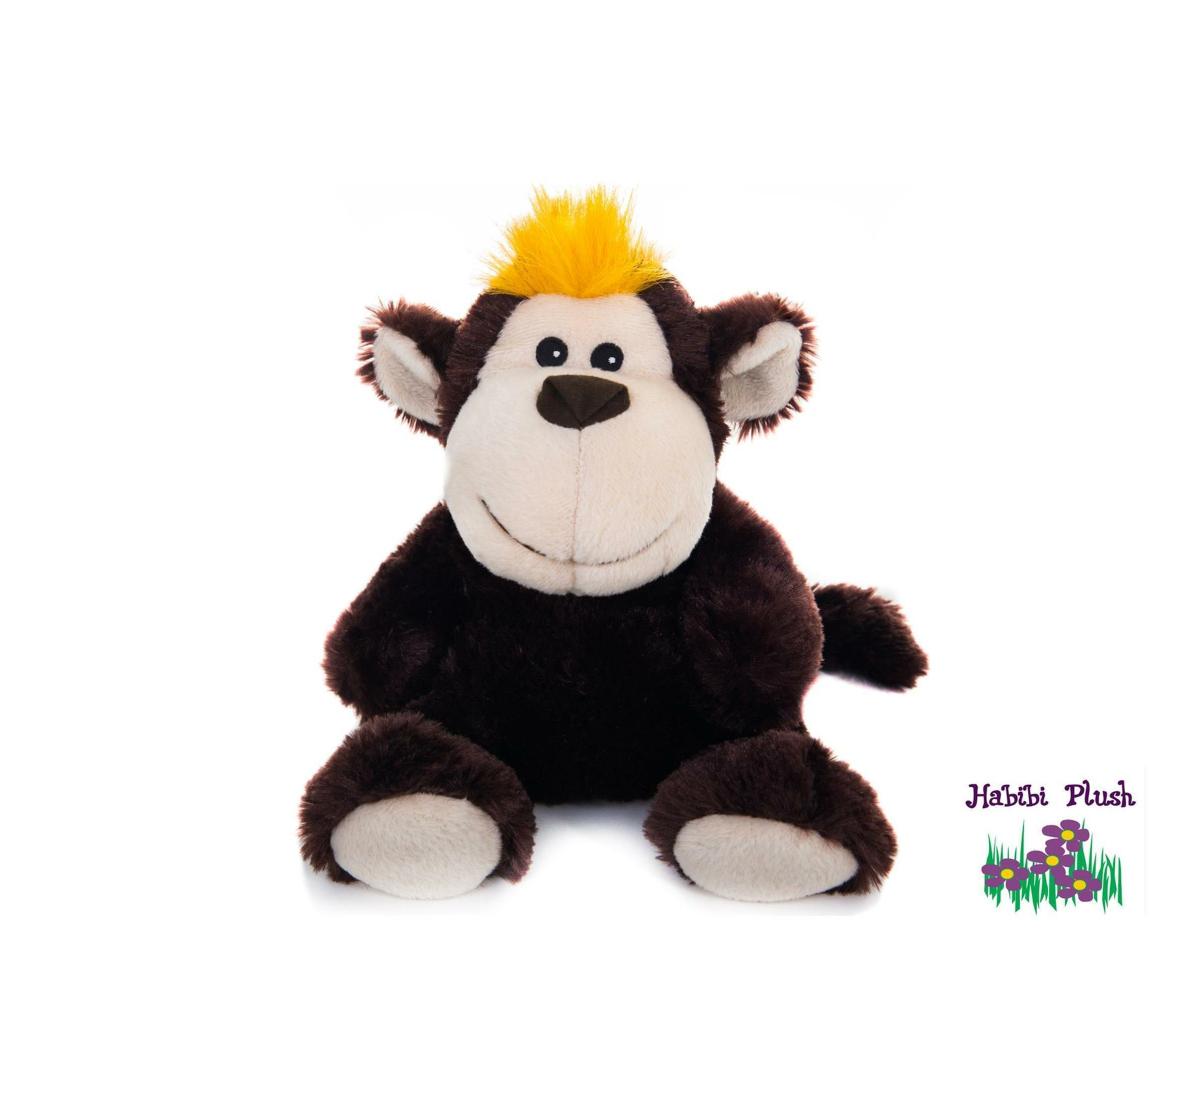 - Habibi Plush : Habibi Schimpanse   -